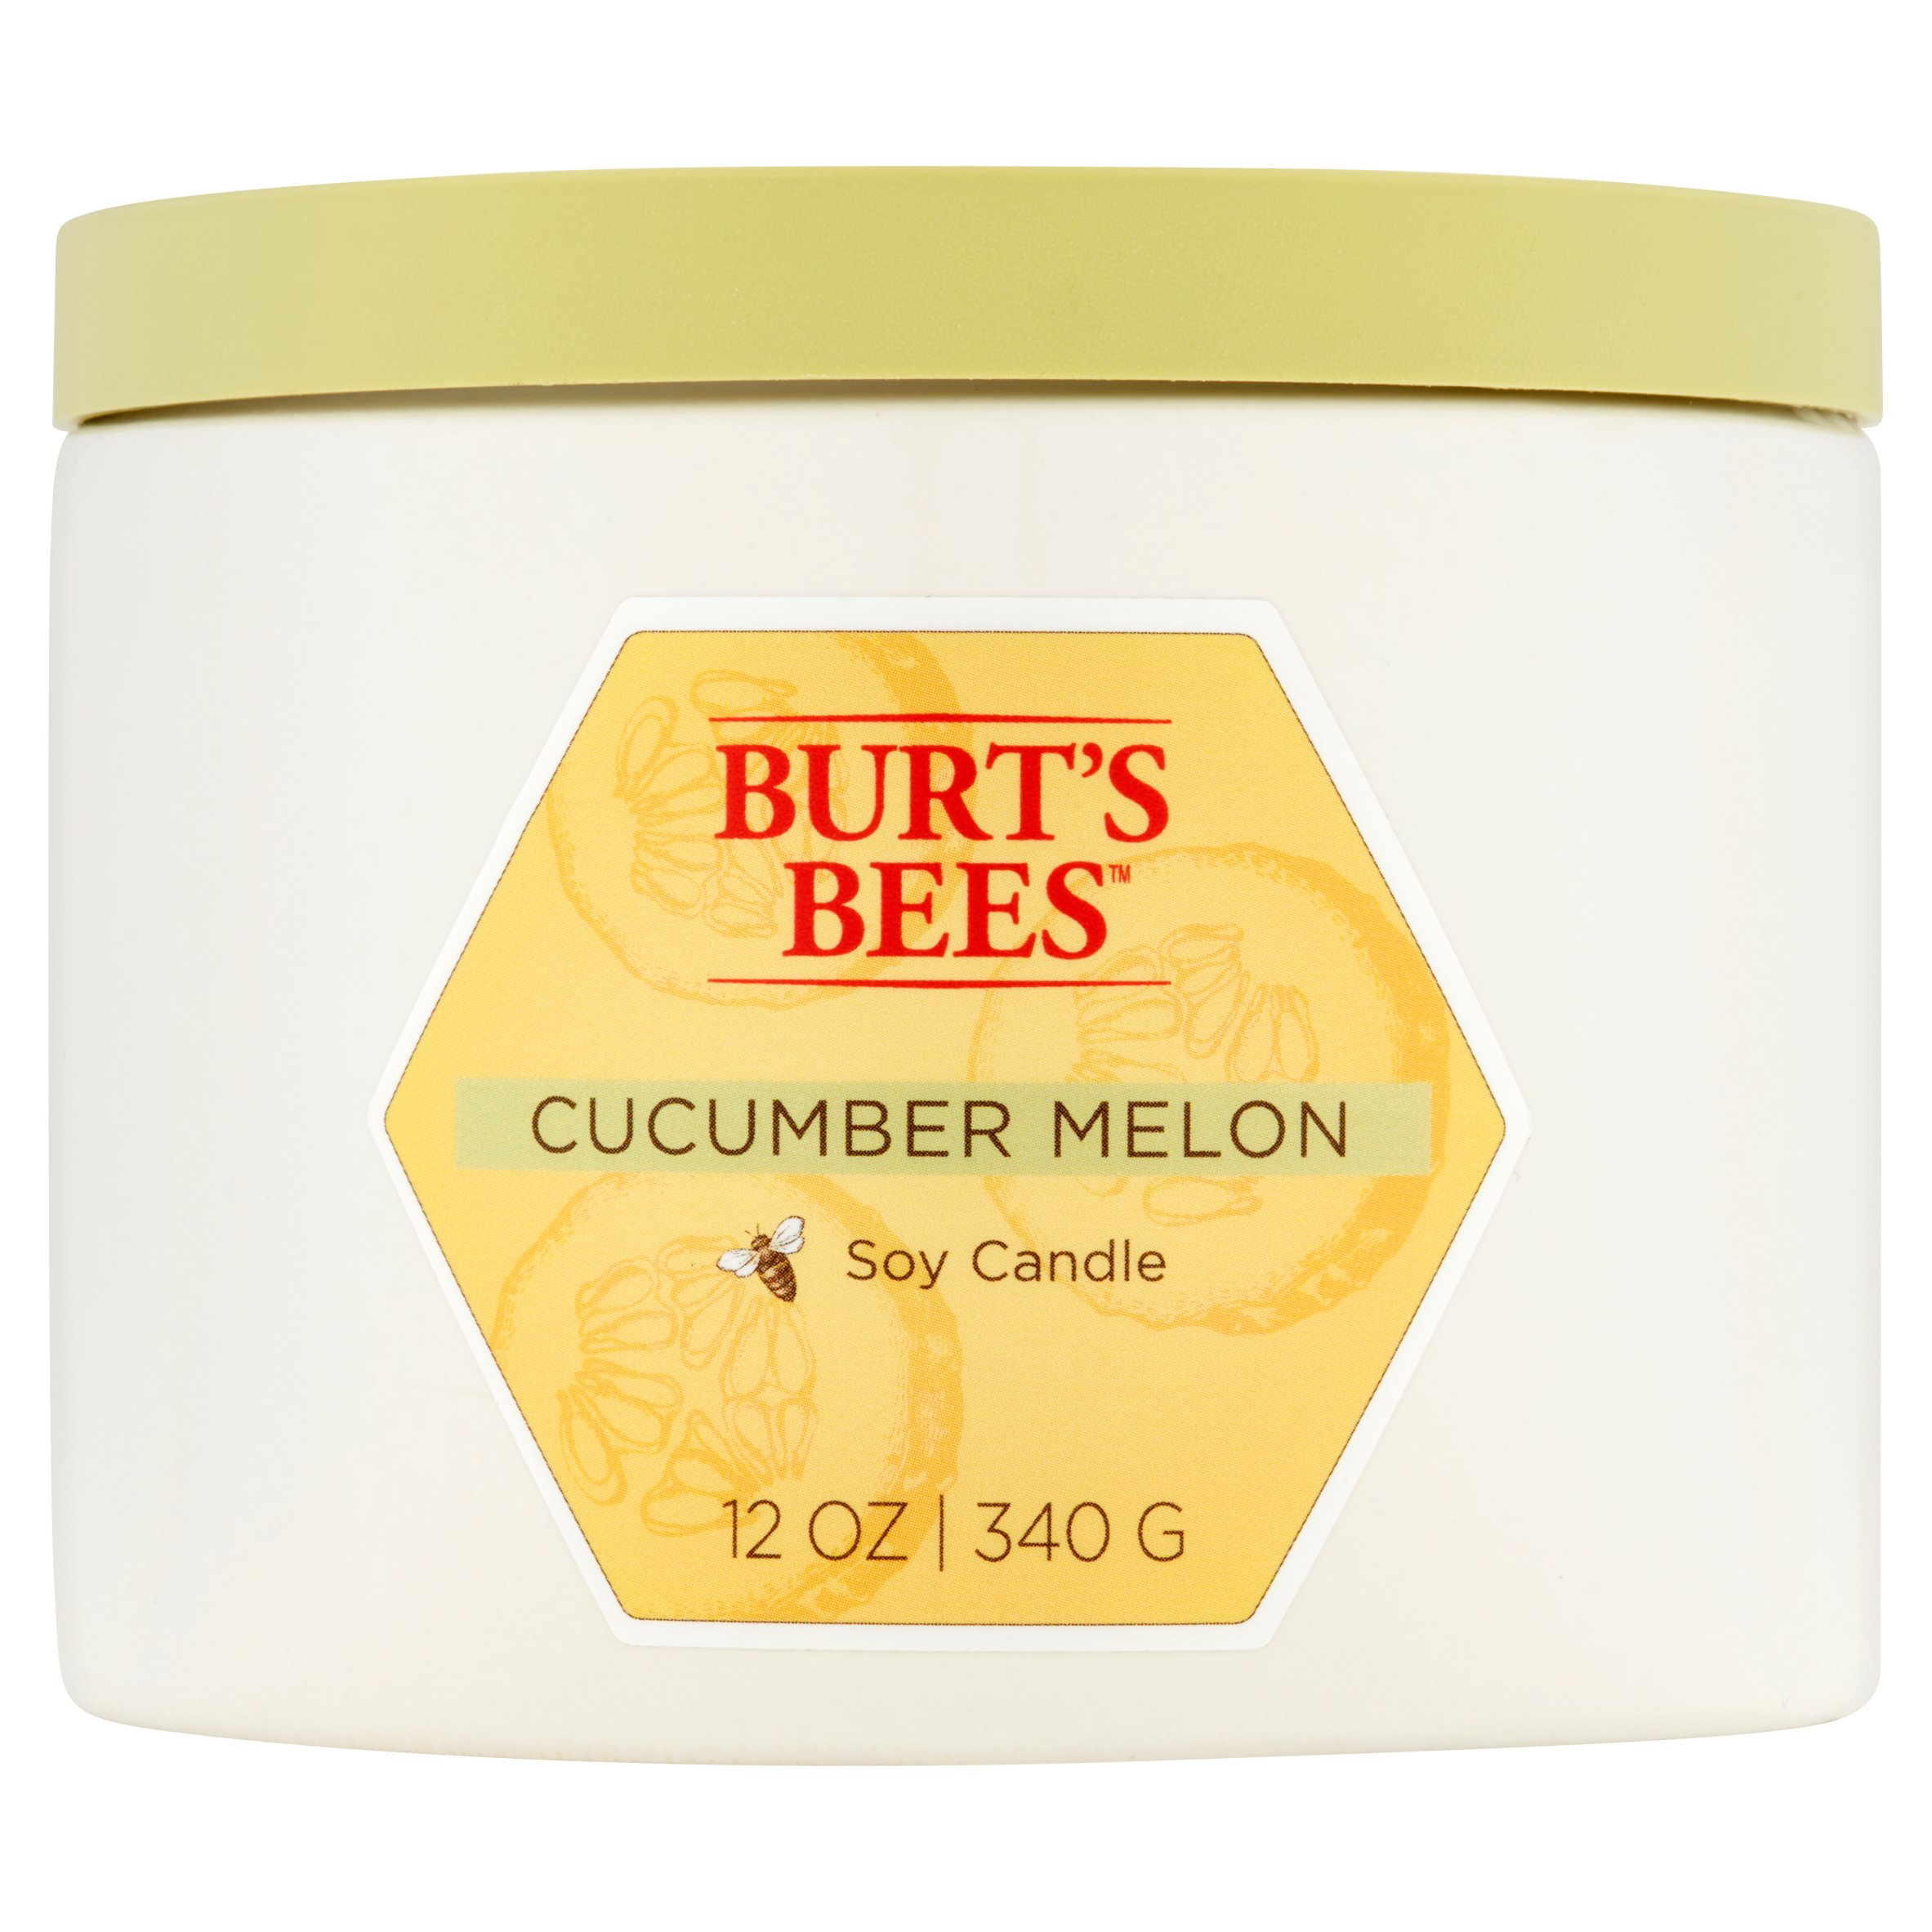 Burt's Bees Cucumber Melon Soy Candle, 12 oz